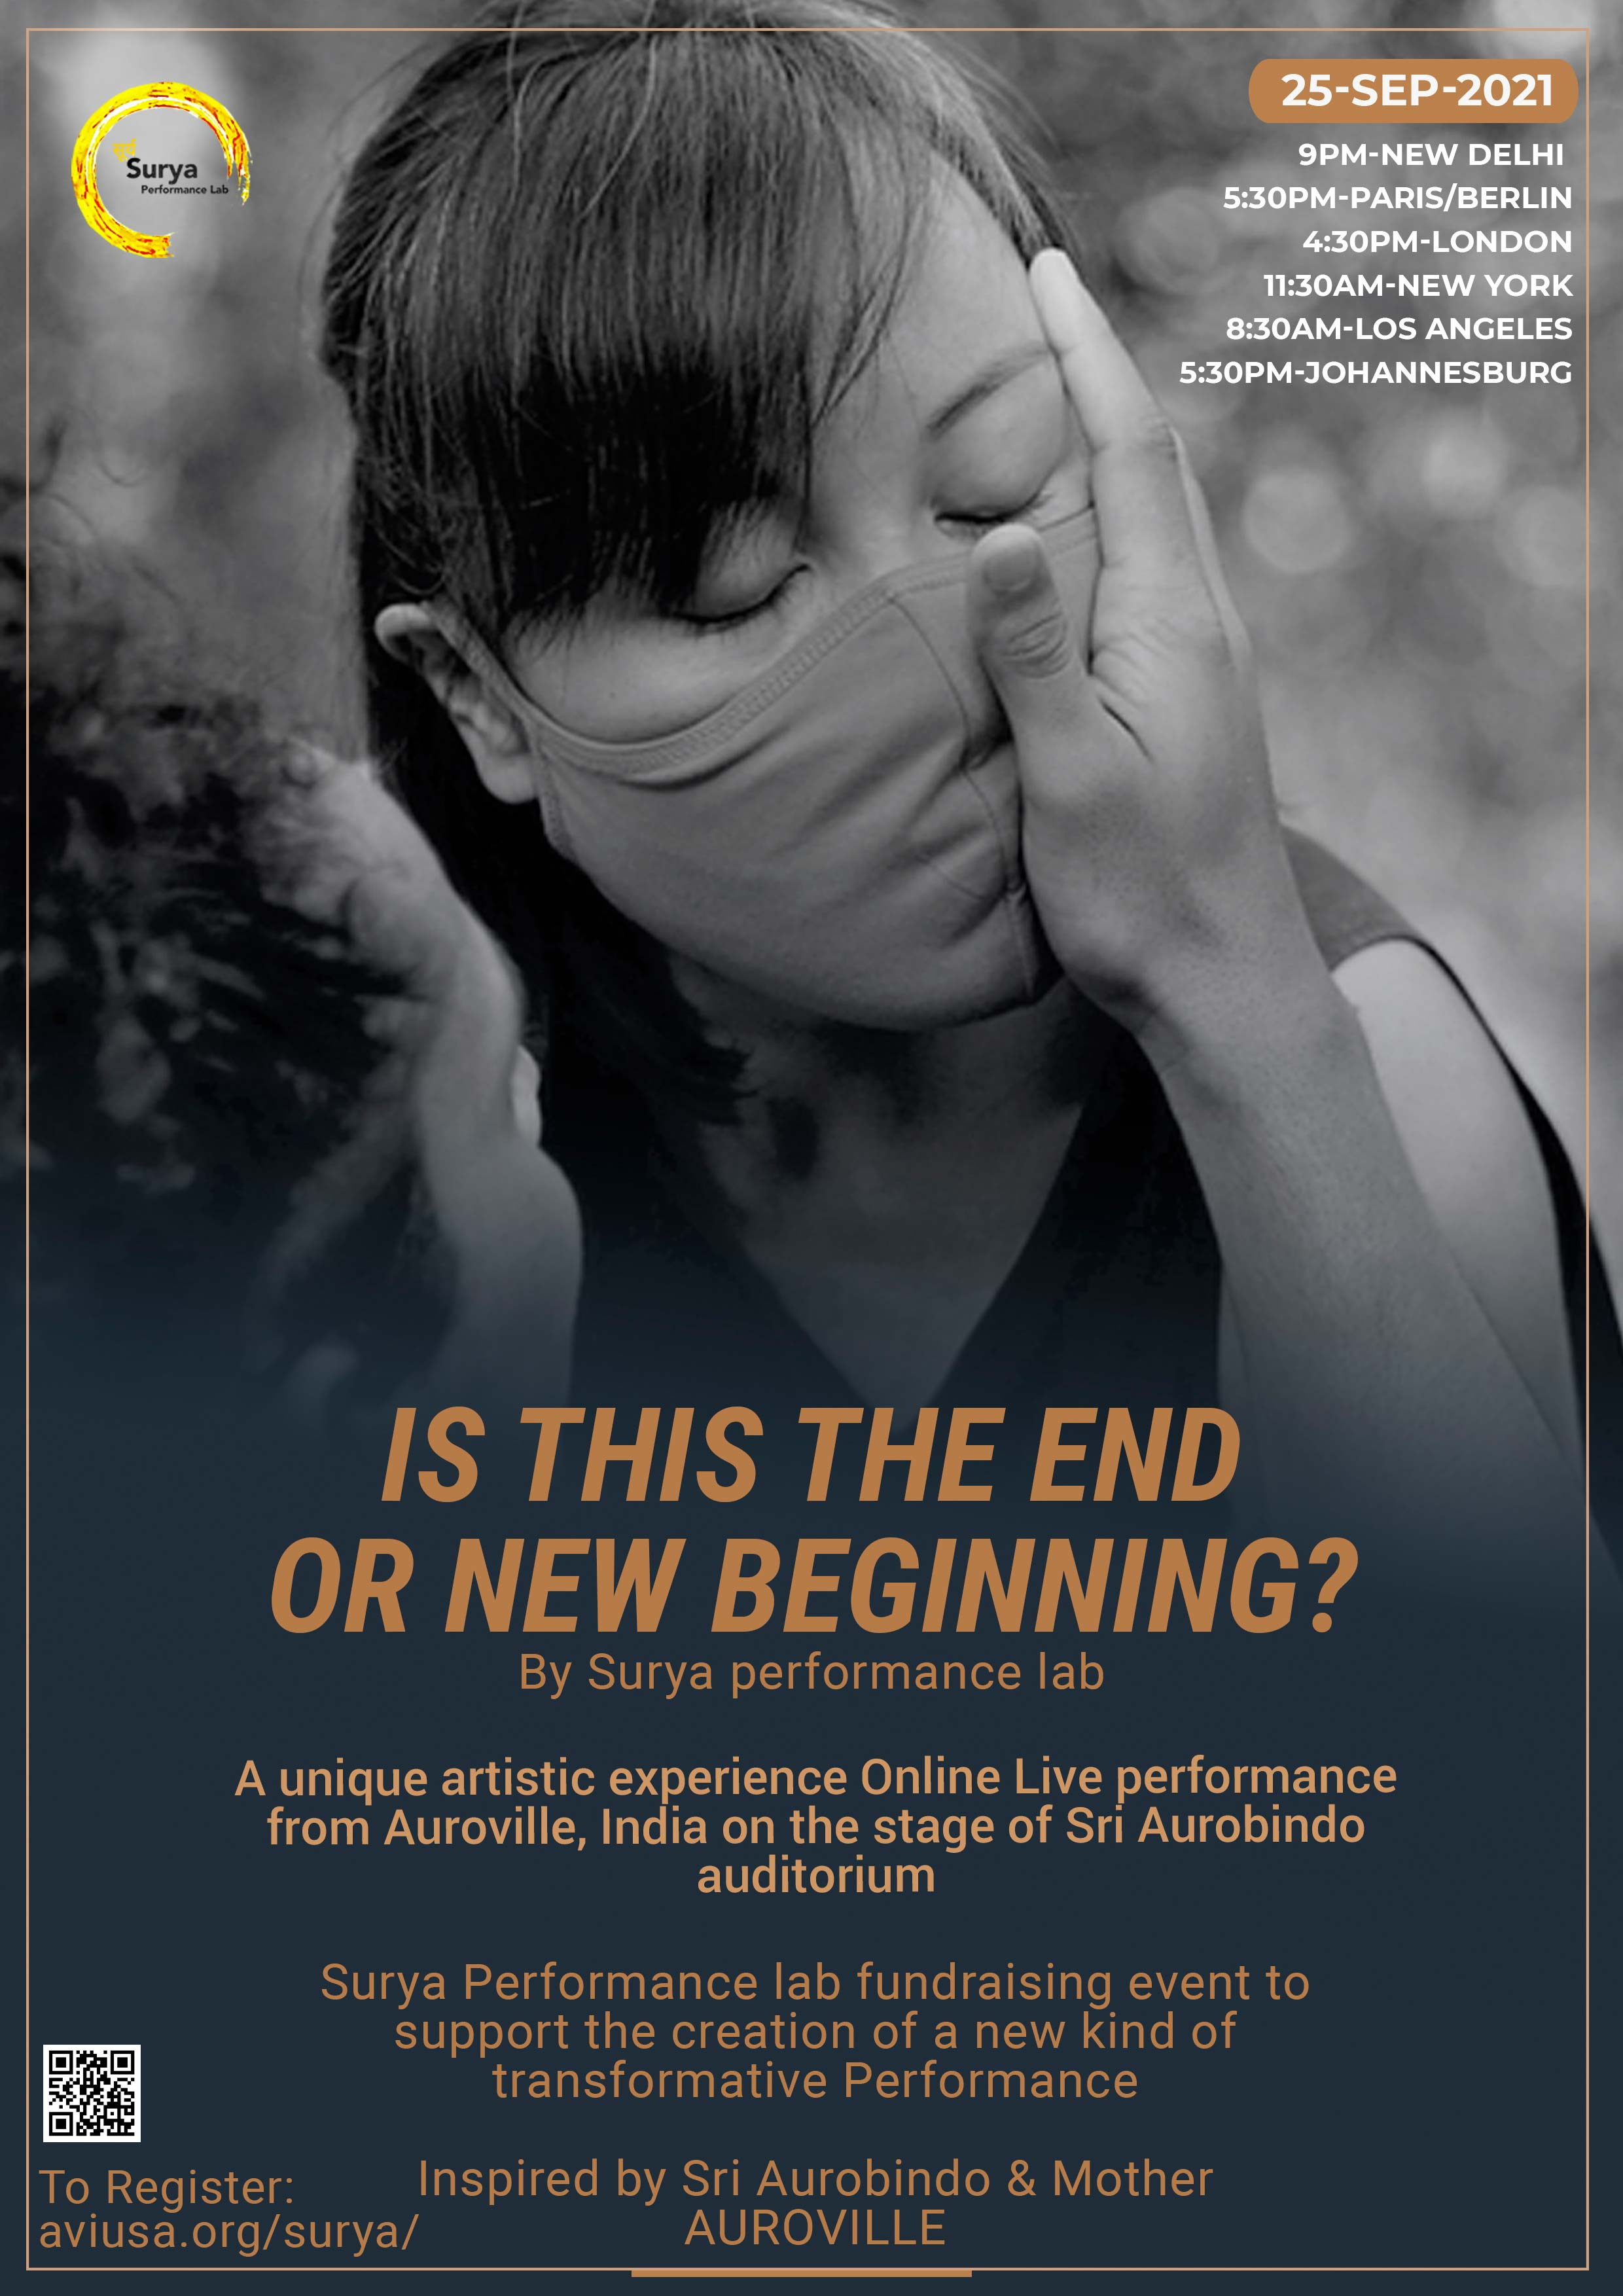 Surya Performance Lab Event